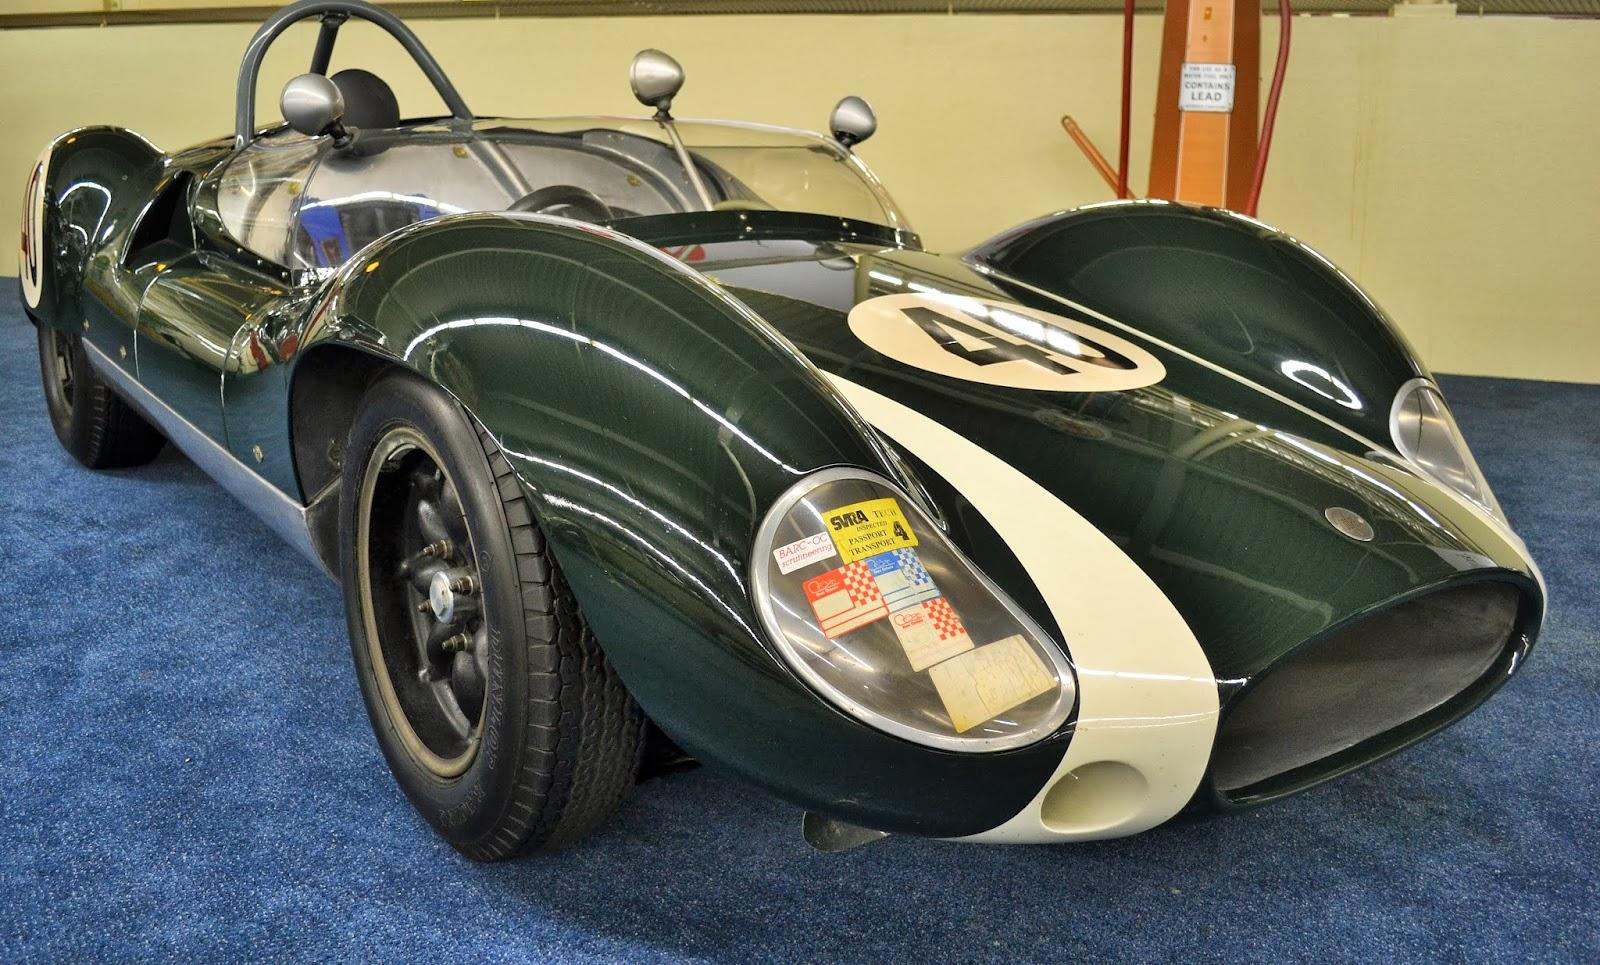 1961 Cooper Monaco Type 57 Mark II Race Car | Travelin\' Man